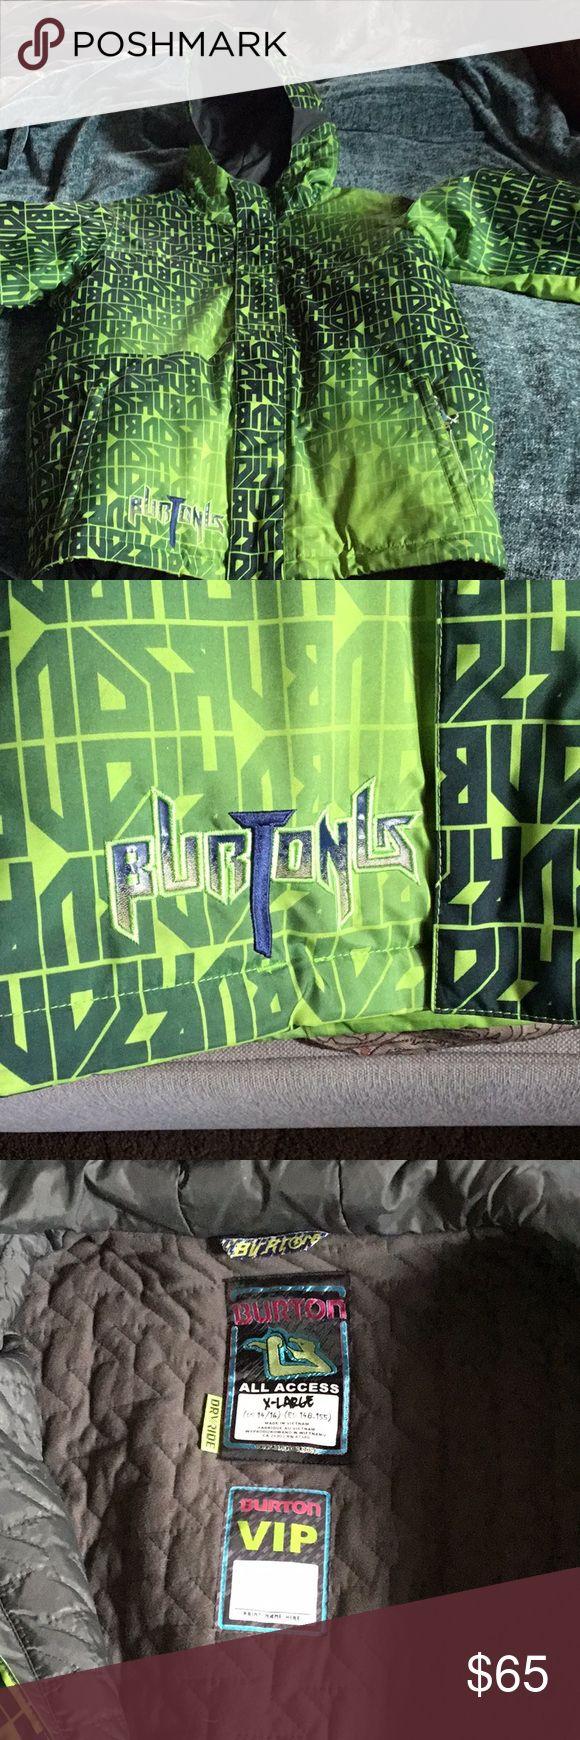 Youth XL Burton ski jacket Green and gray burton ski jacket. Like new condition, Used 3 times . Burton Jackets & Coats